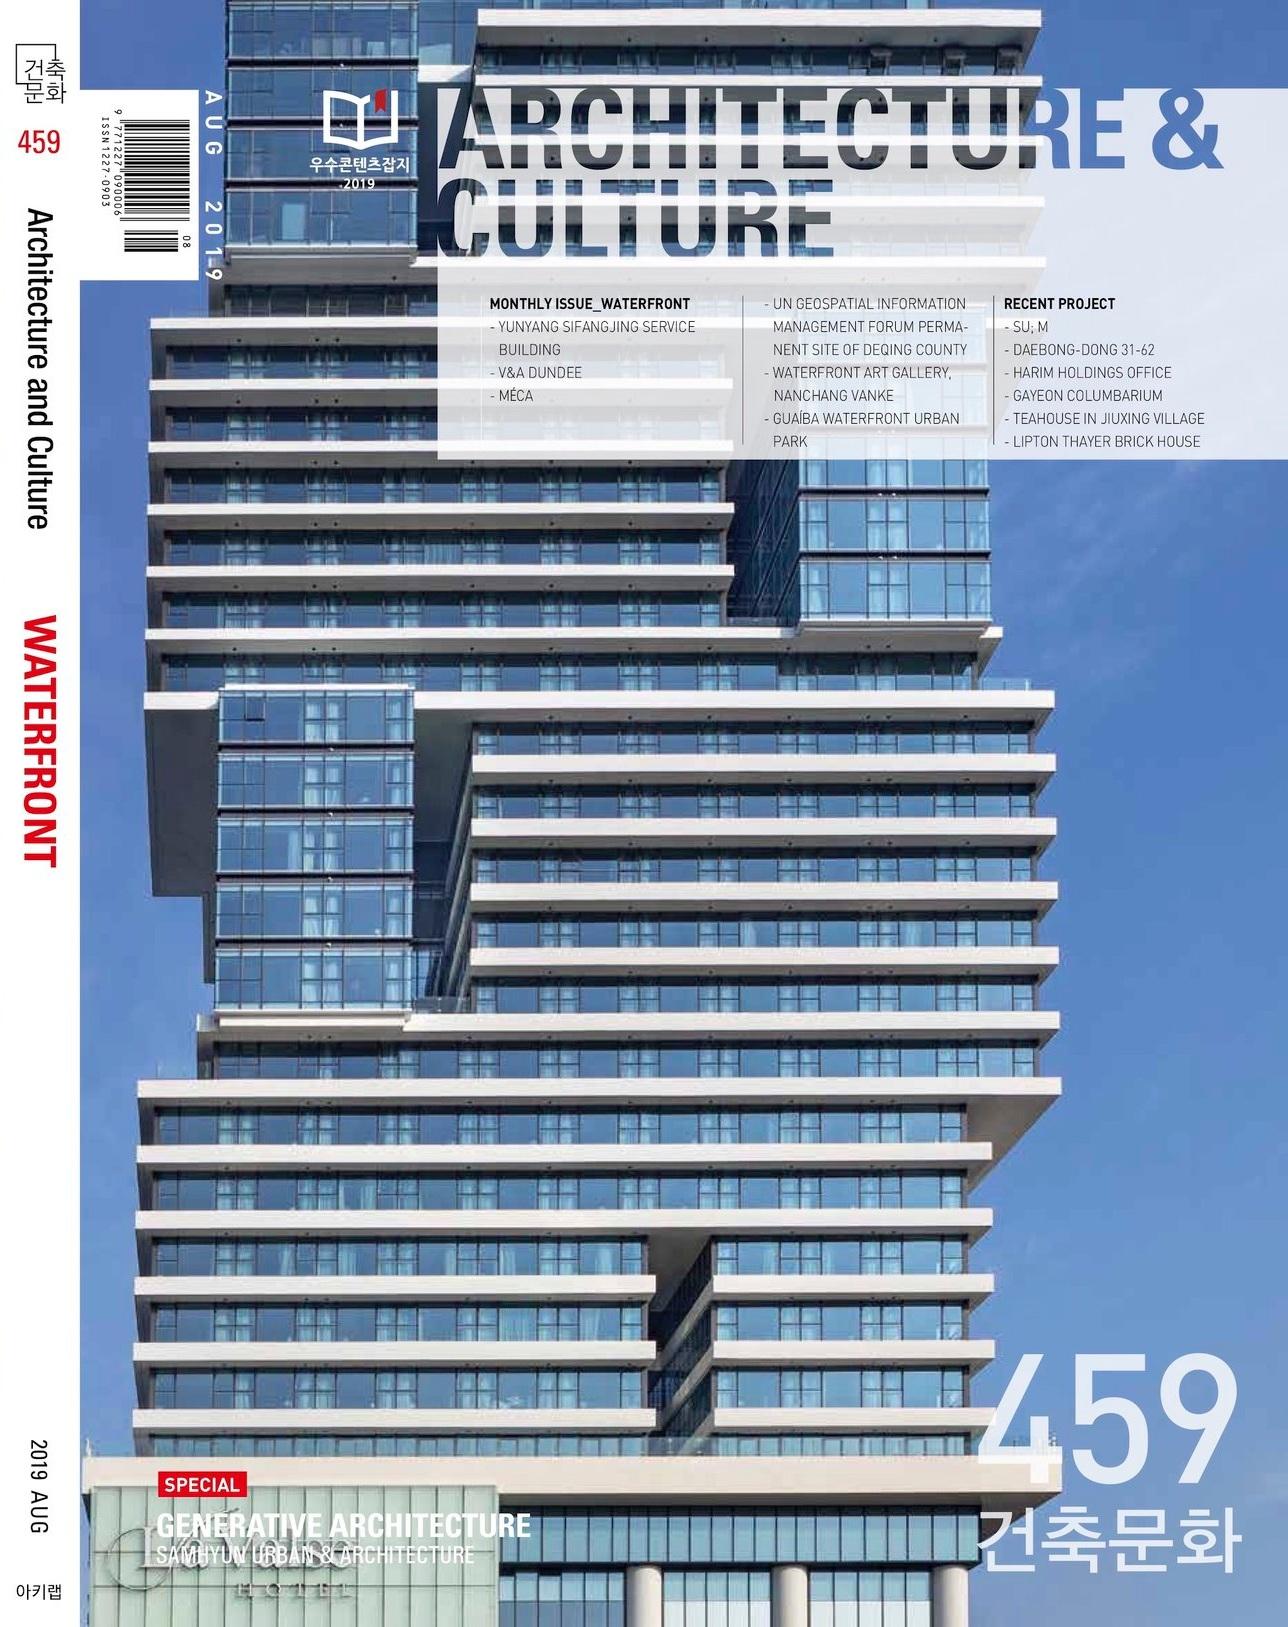 201908 韩国Architecture & Culture 封面-2-1.jpg